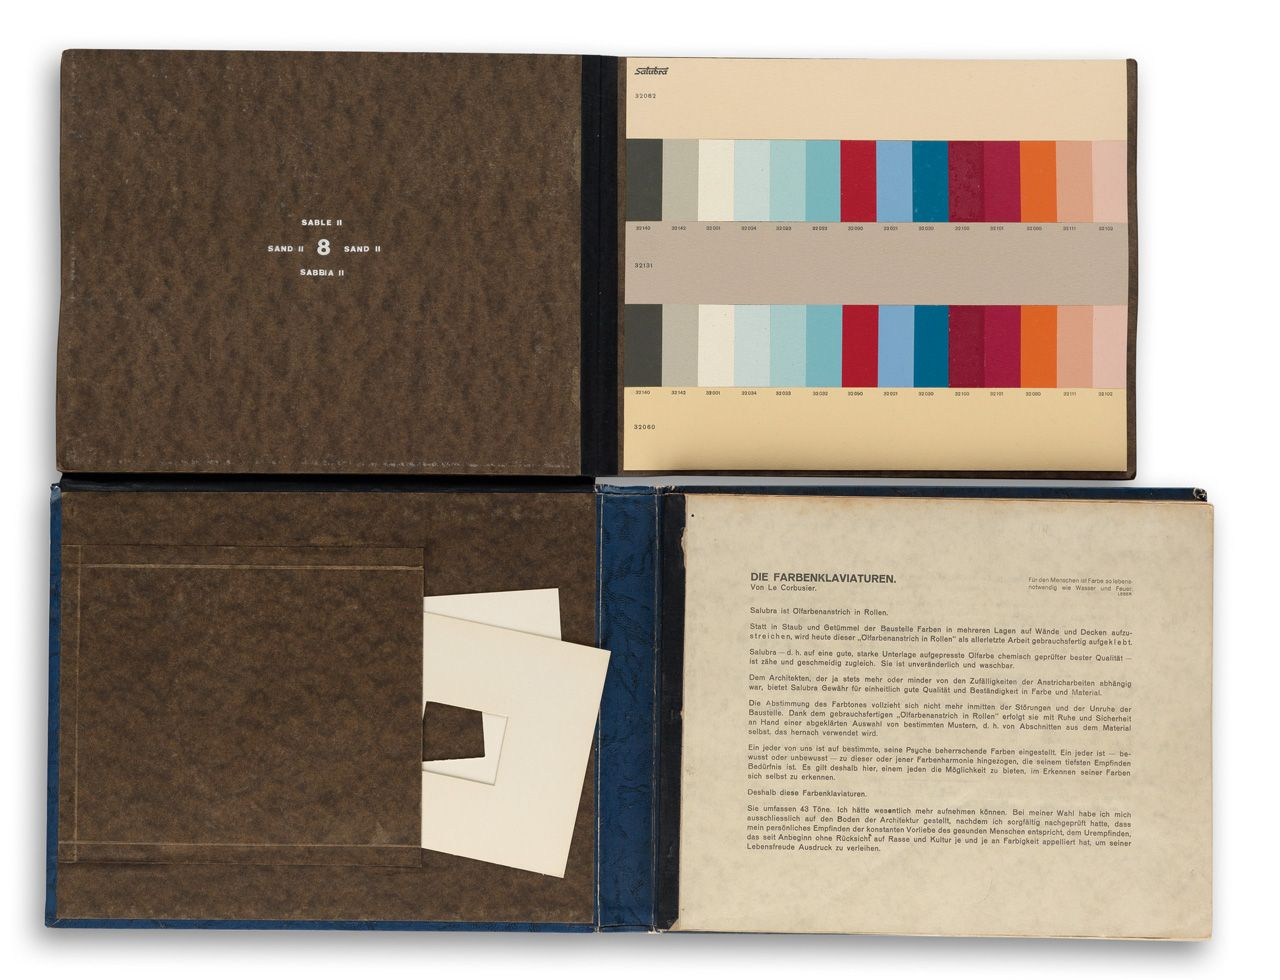 Le Corbusier's Color Theories